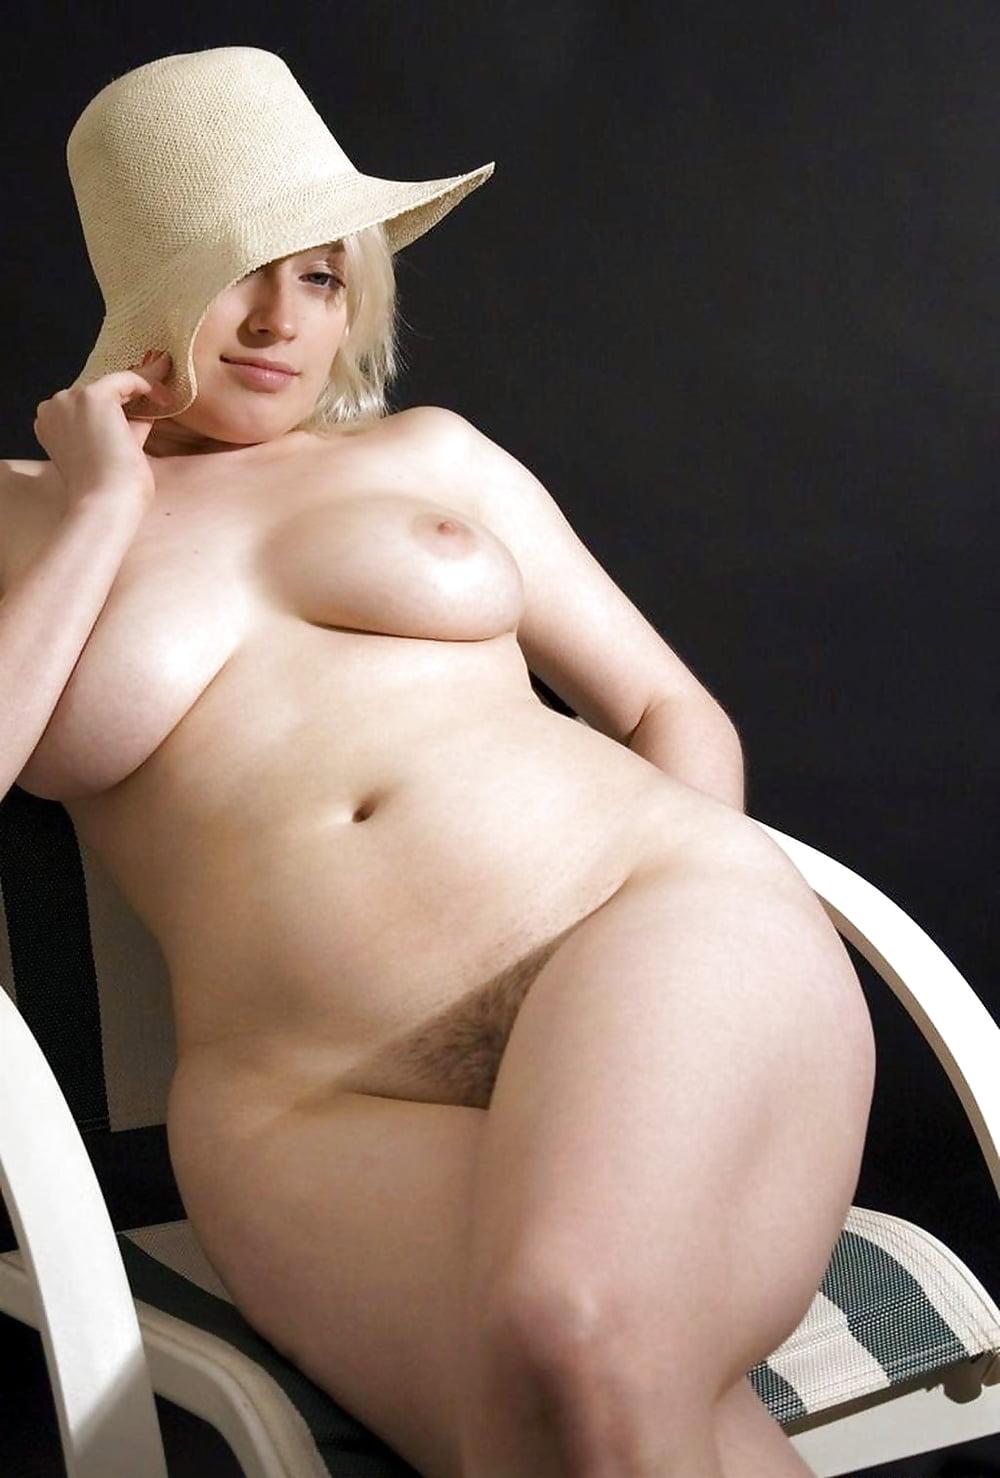 Nake girls fat blond naked women womensex nude breasts